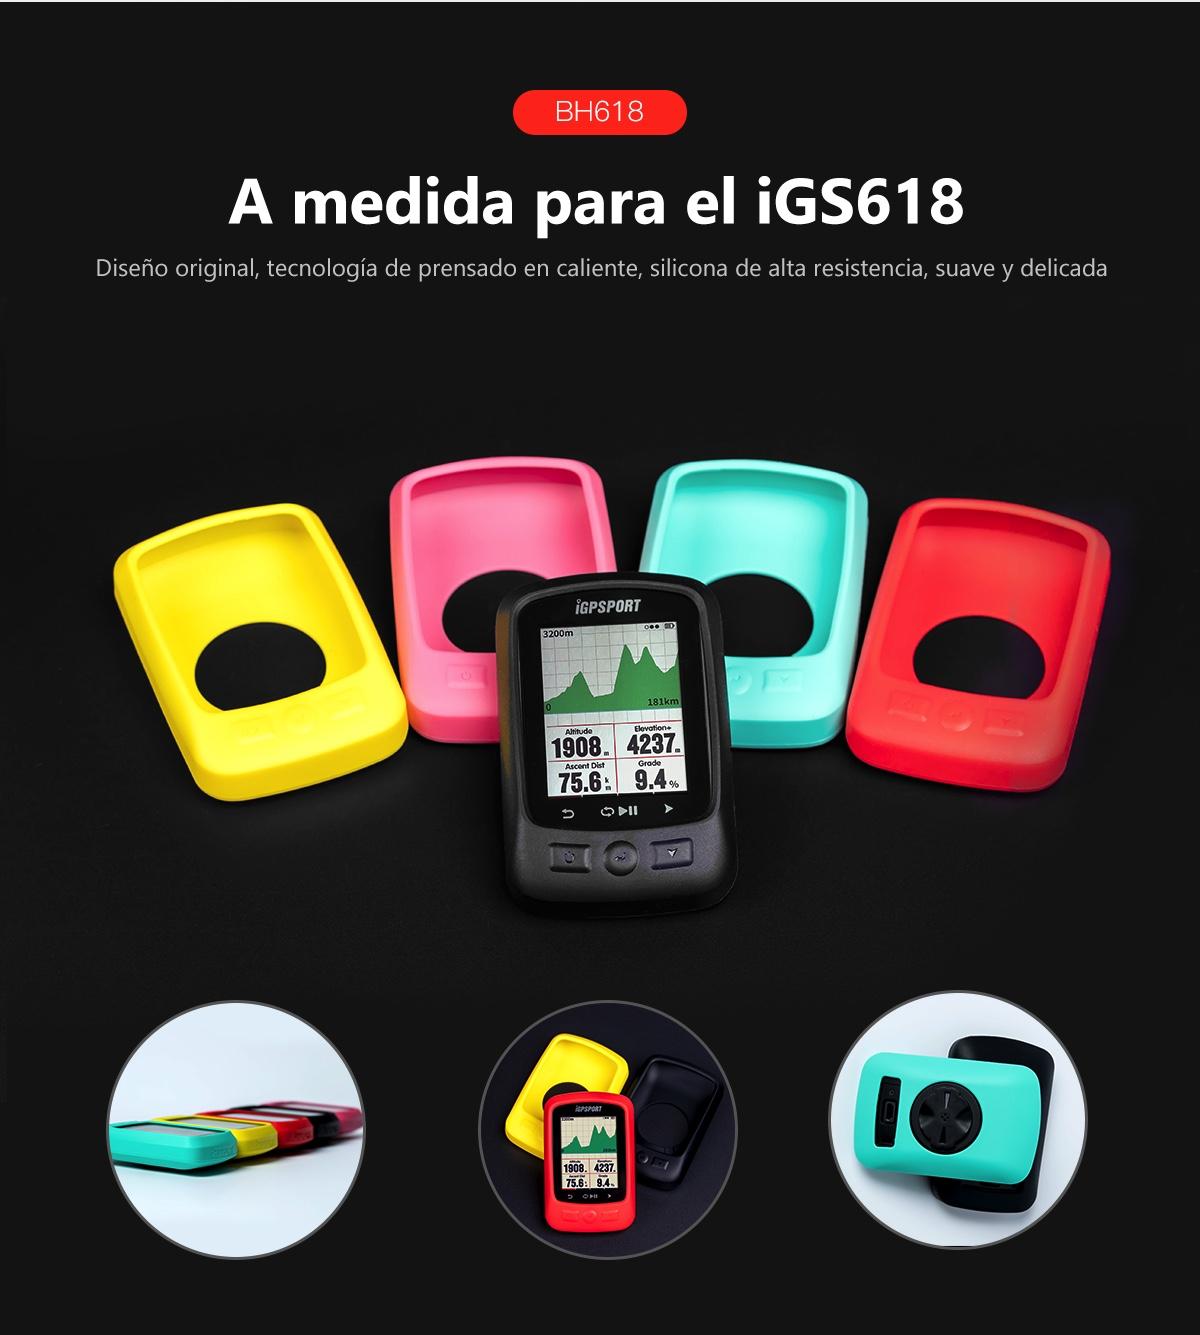 BH618-Spanish_03